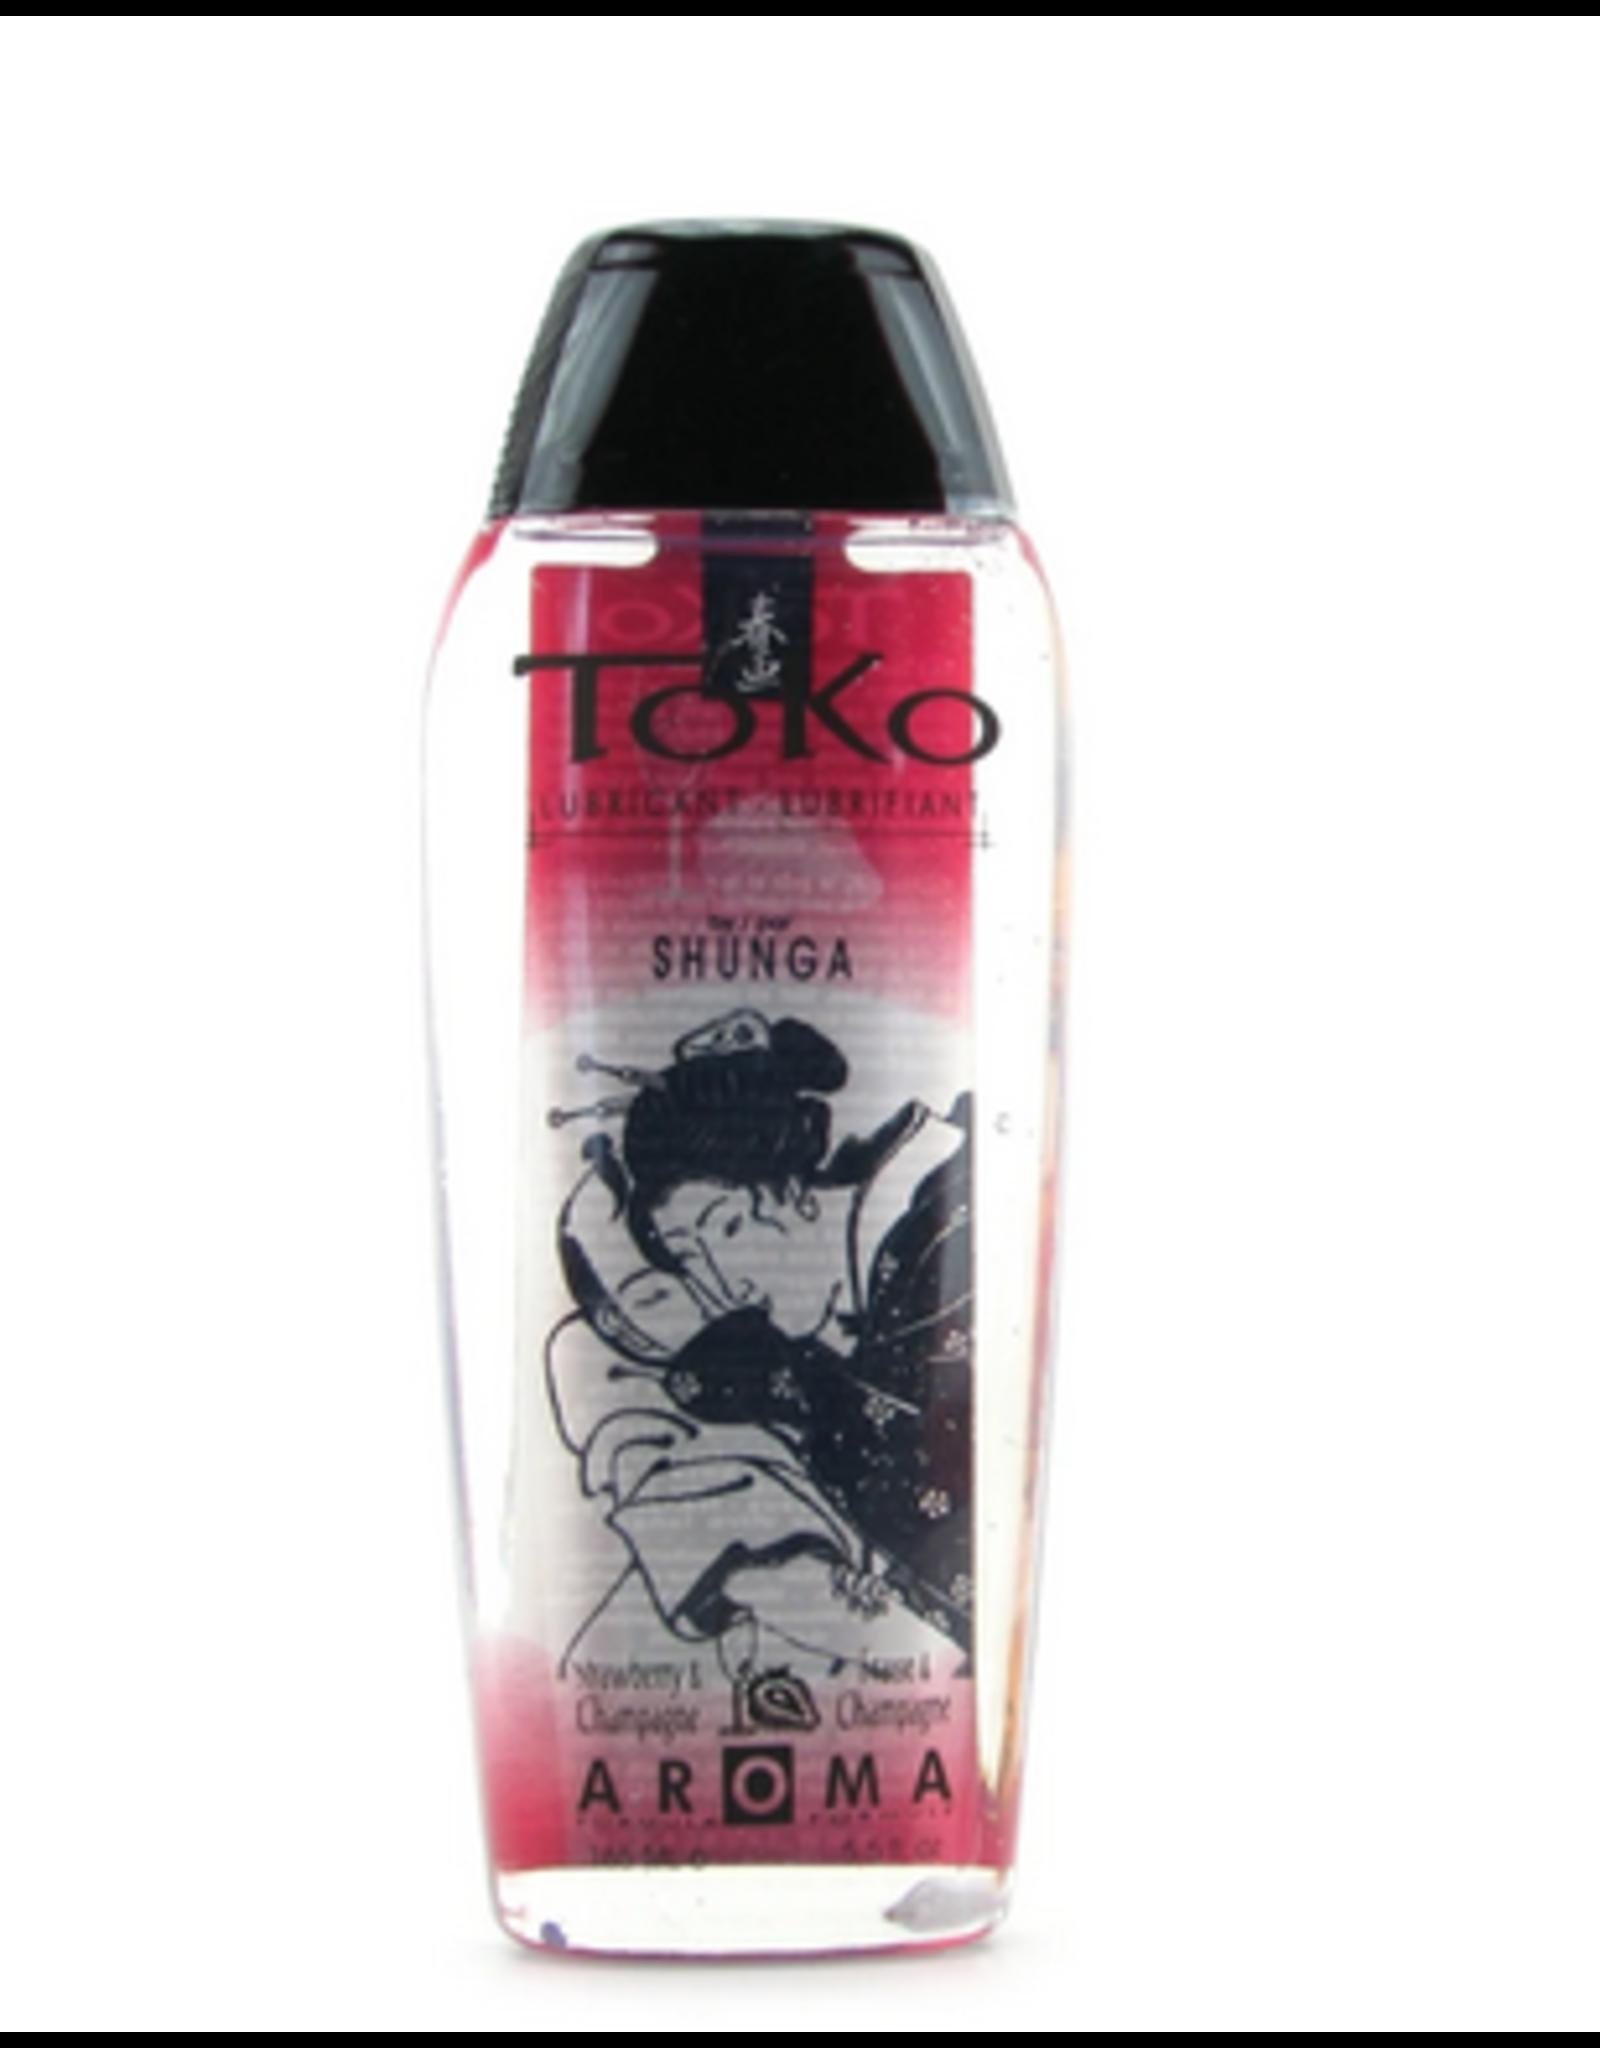 Shunga Toko Luricant Sparkling Strawberry Wine 165ml / 5.5oz